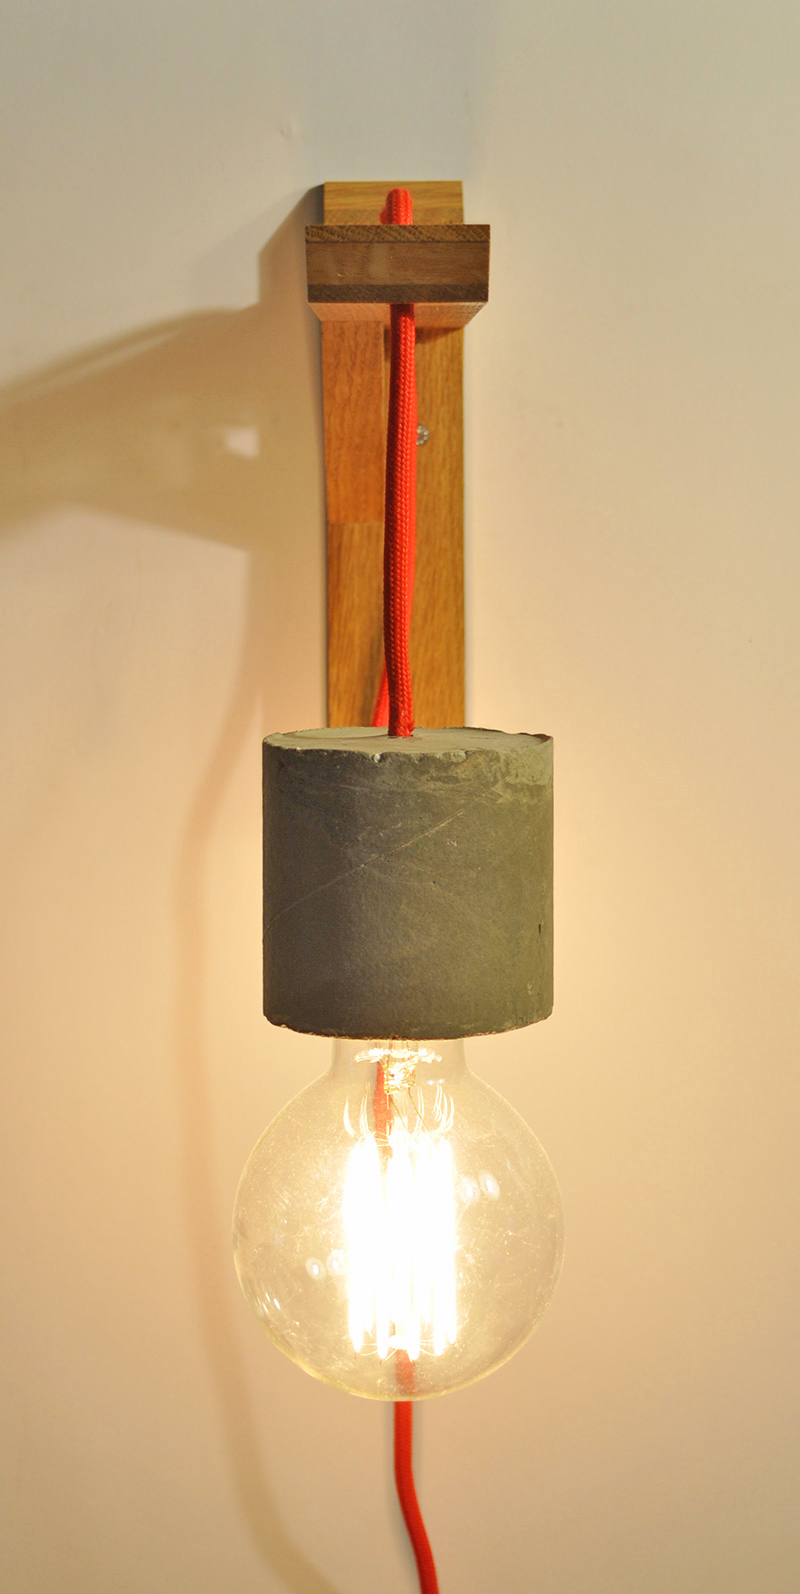 OAK GIBBET #3 Wandampe_ Eiche_ 23cm x 14cm x 5cm_  Edison Vintage Glühbirne 40W_ Rotes Textilkabel_